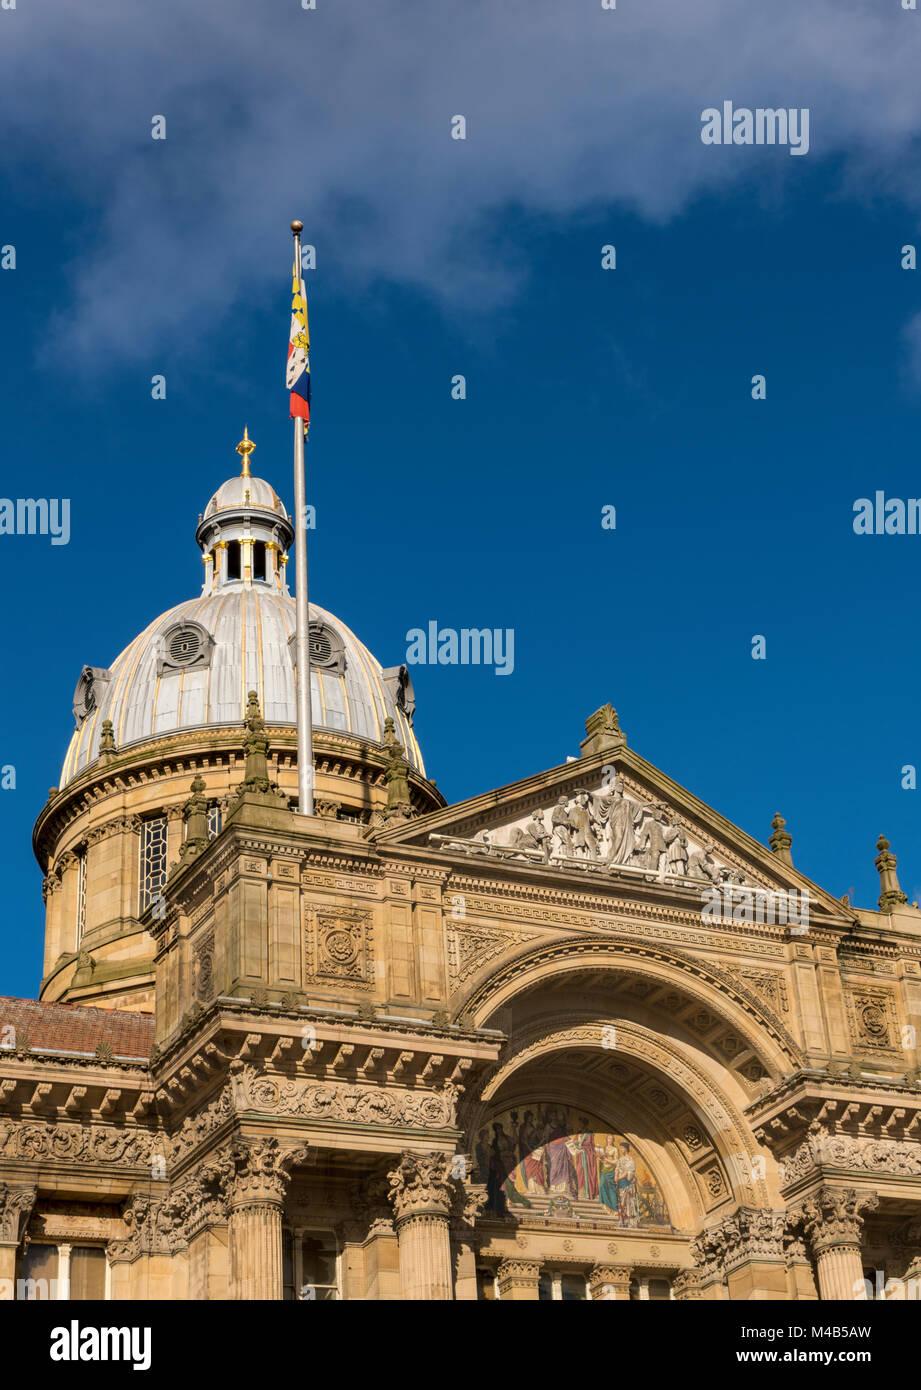 Stadt Szenen aus Birmingham, Großbritannien Stockfoto